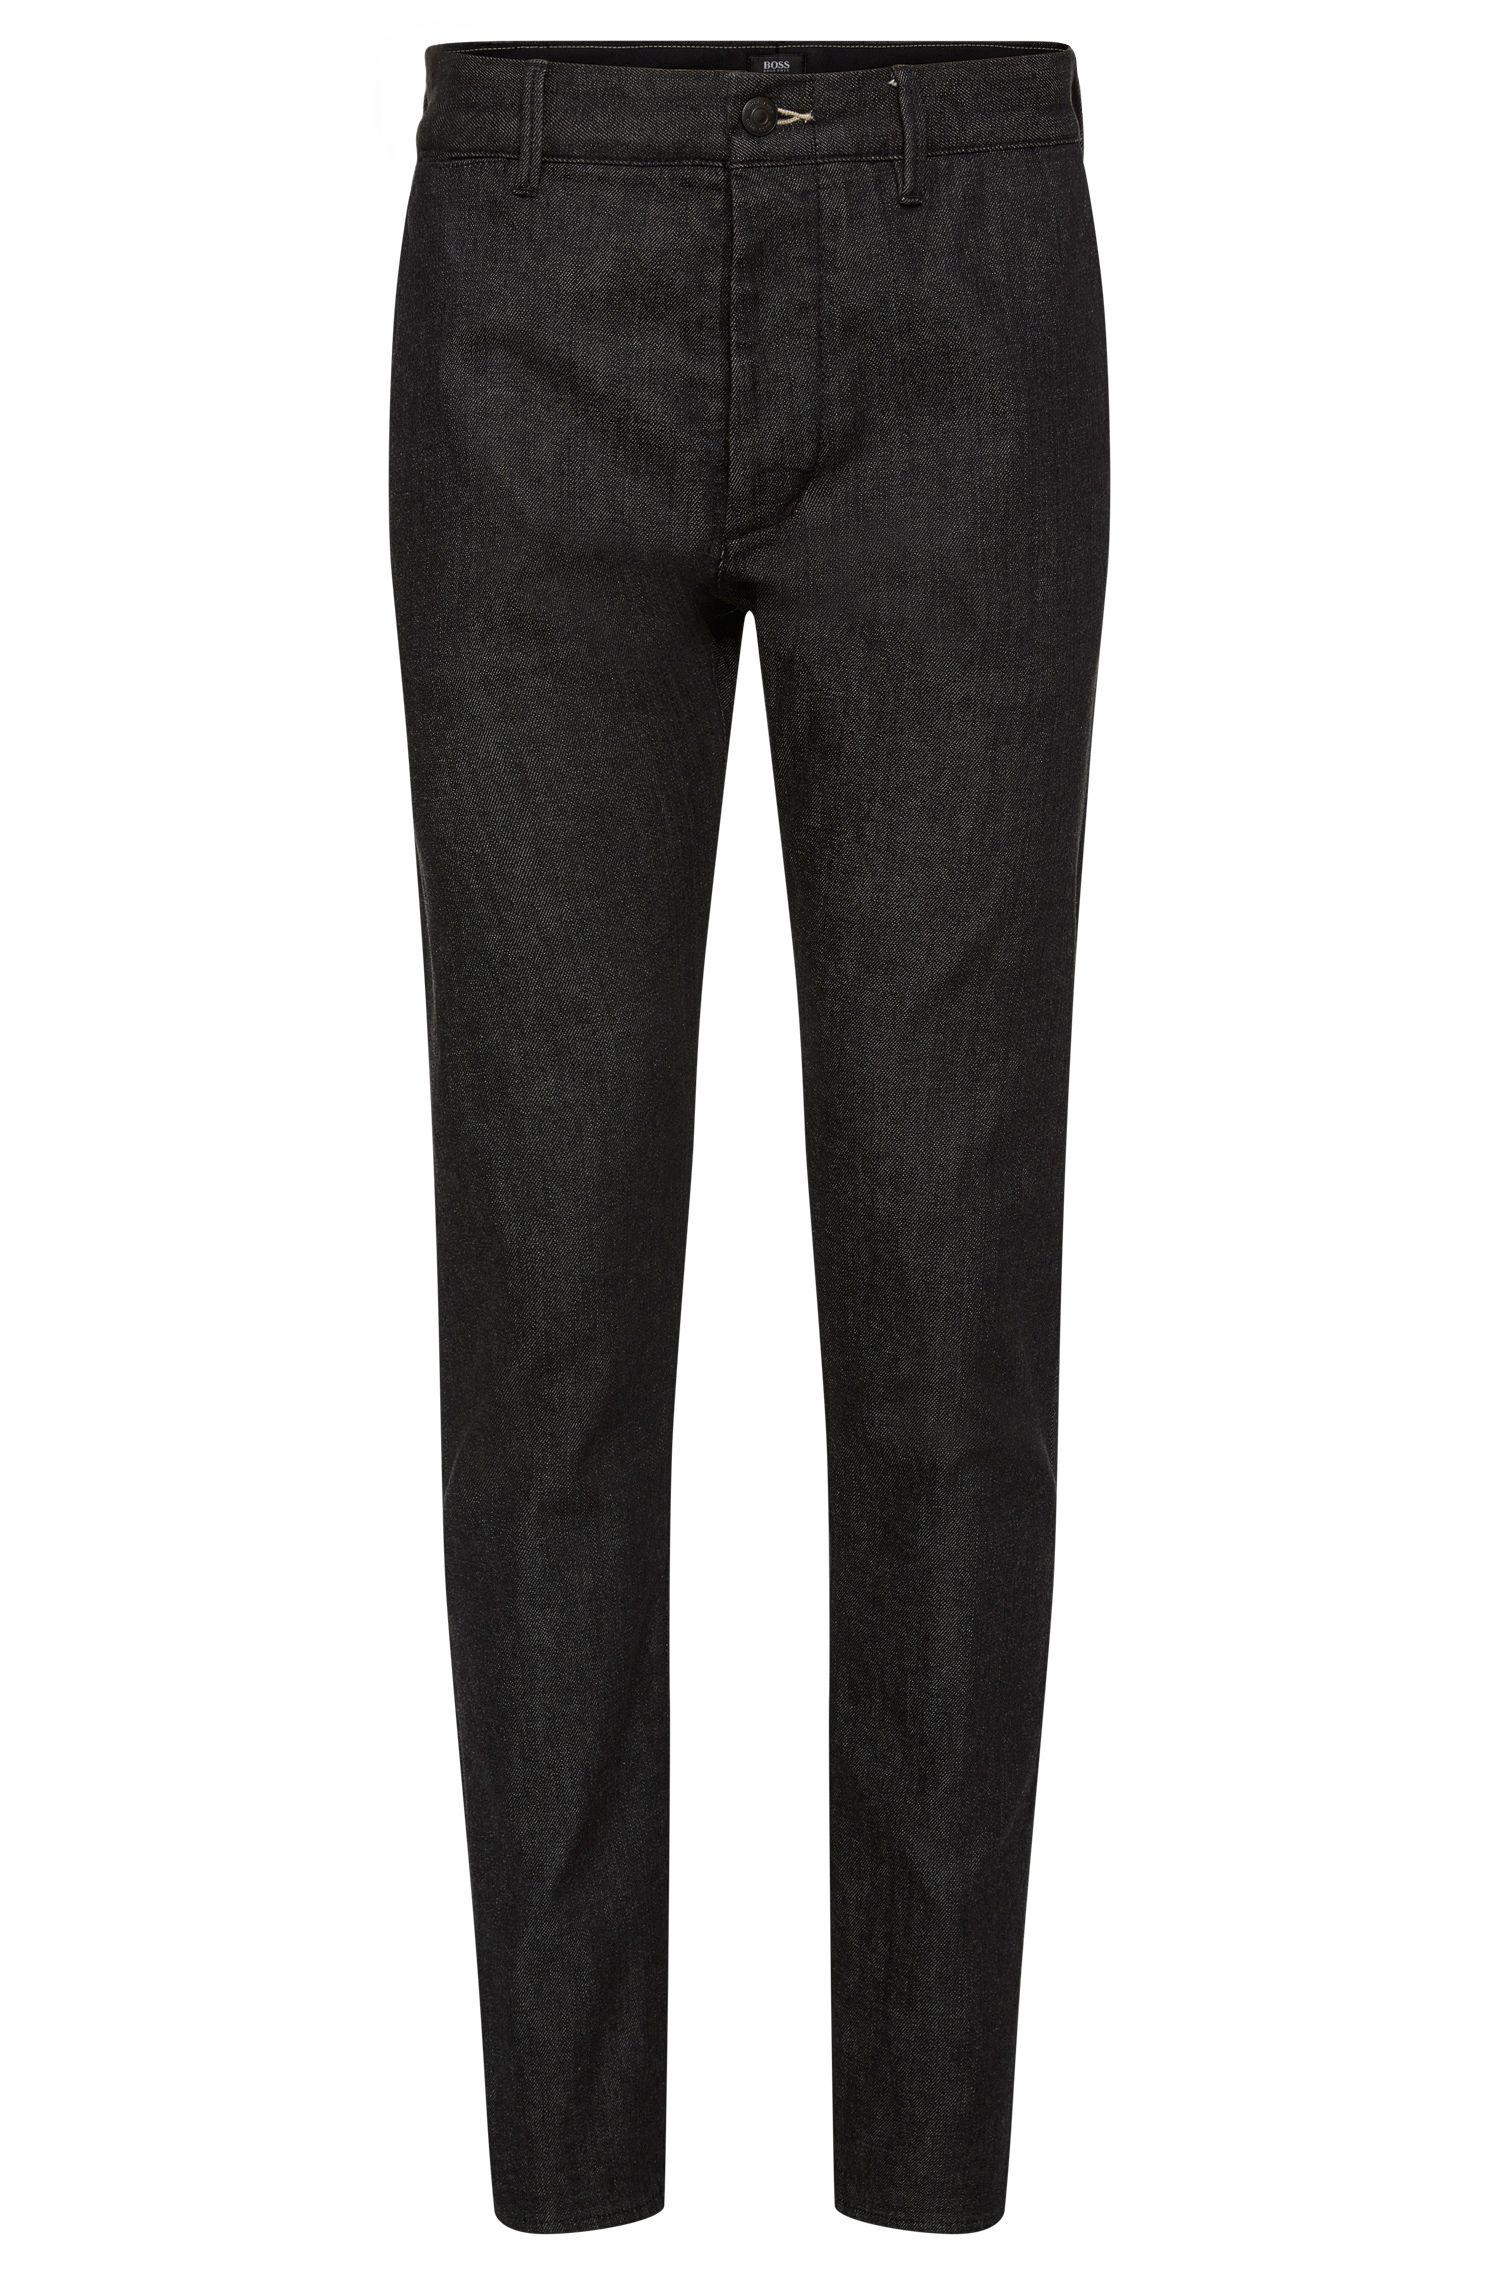 Regular-Fit Jeans aus Stretch-Baumwolle in Rinsed-Optik: 'Fremont-Edge'